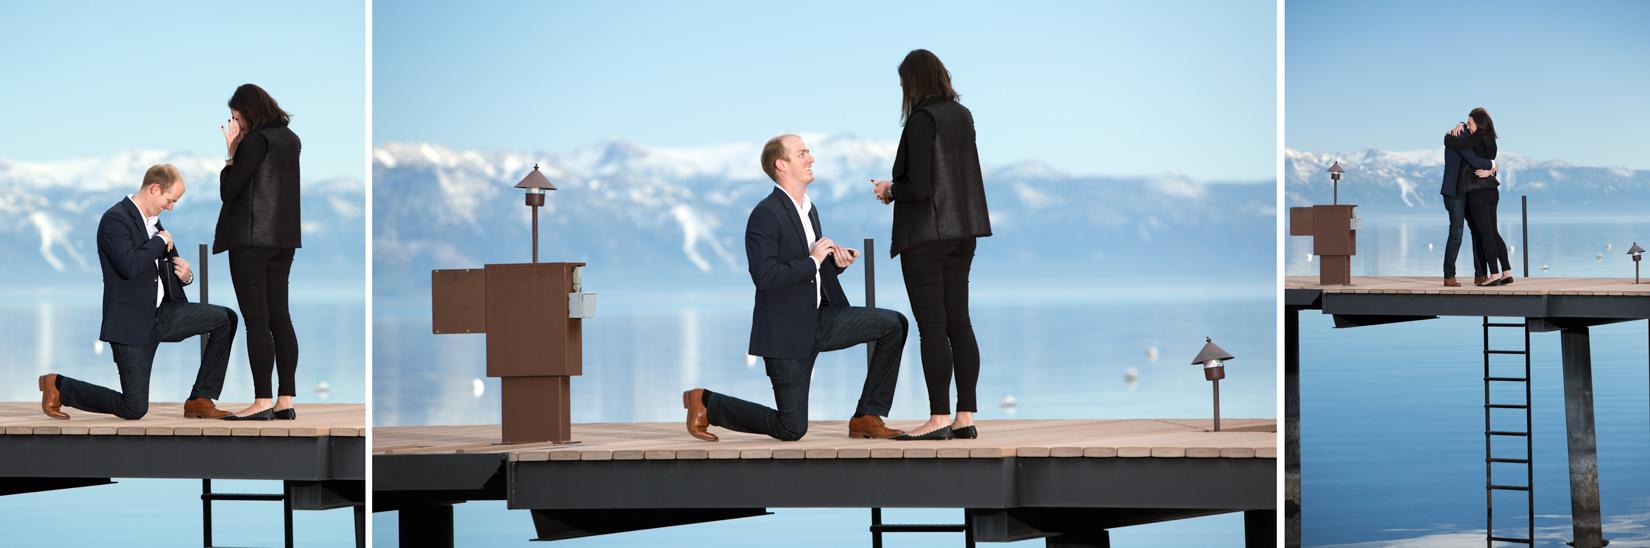 engagement-proposal